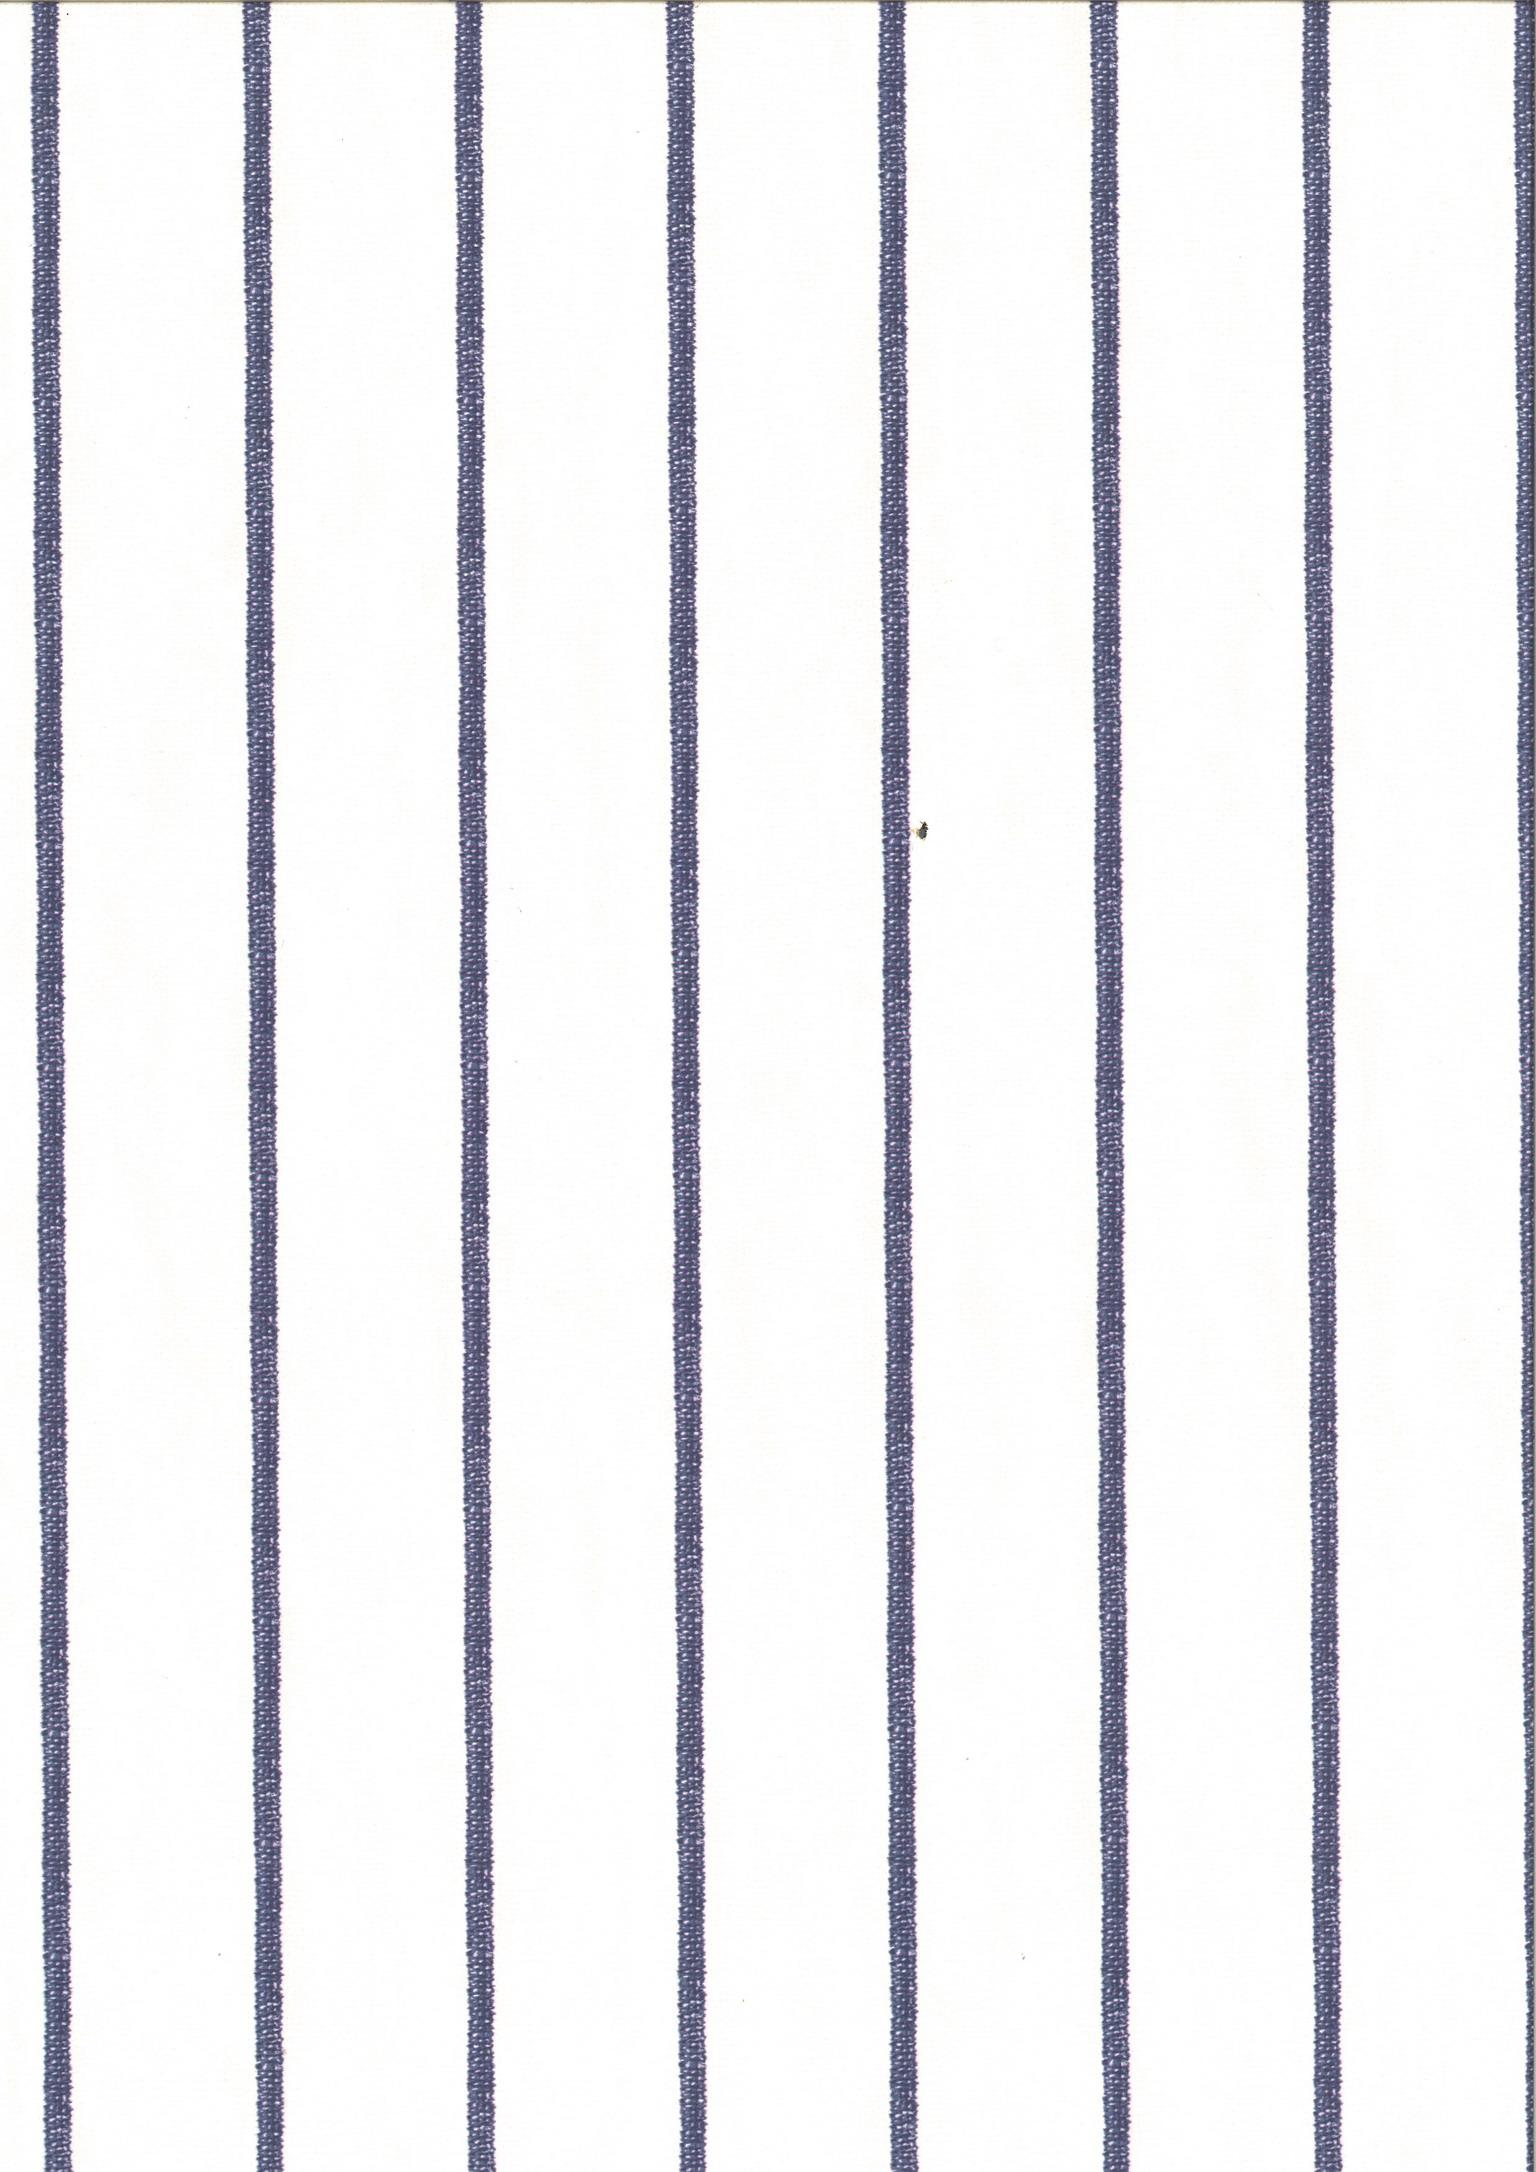 PIENZA GESSATO ivory plum stripes